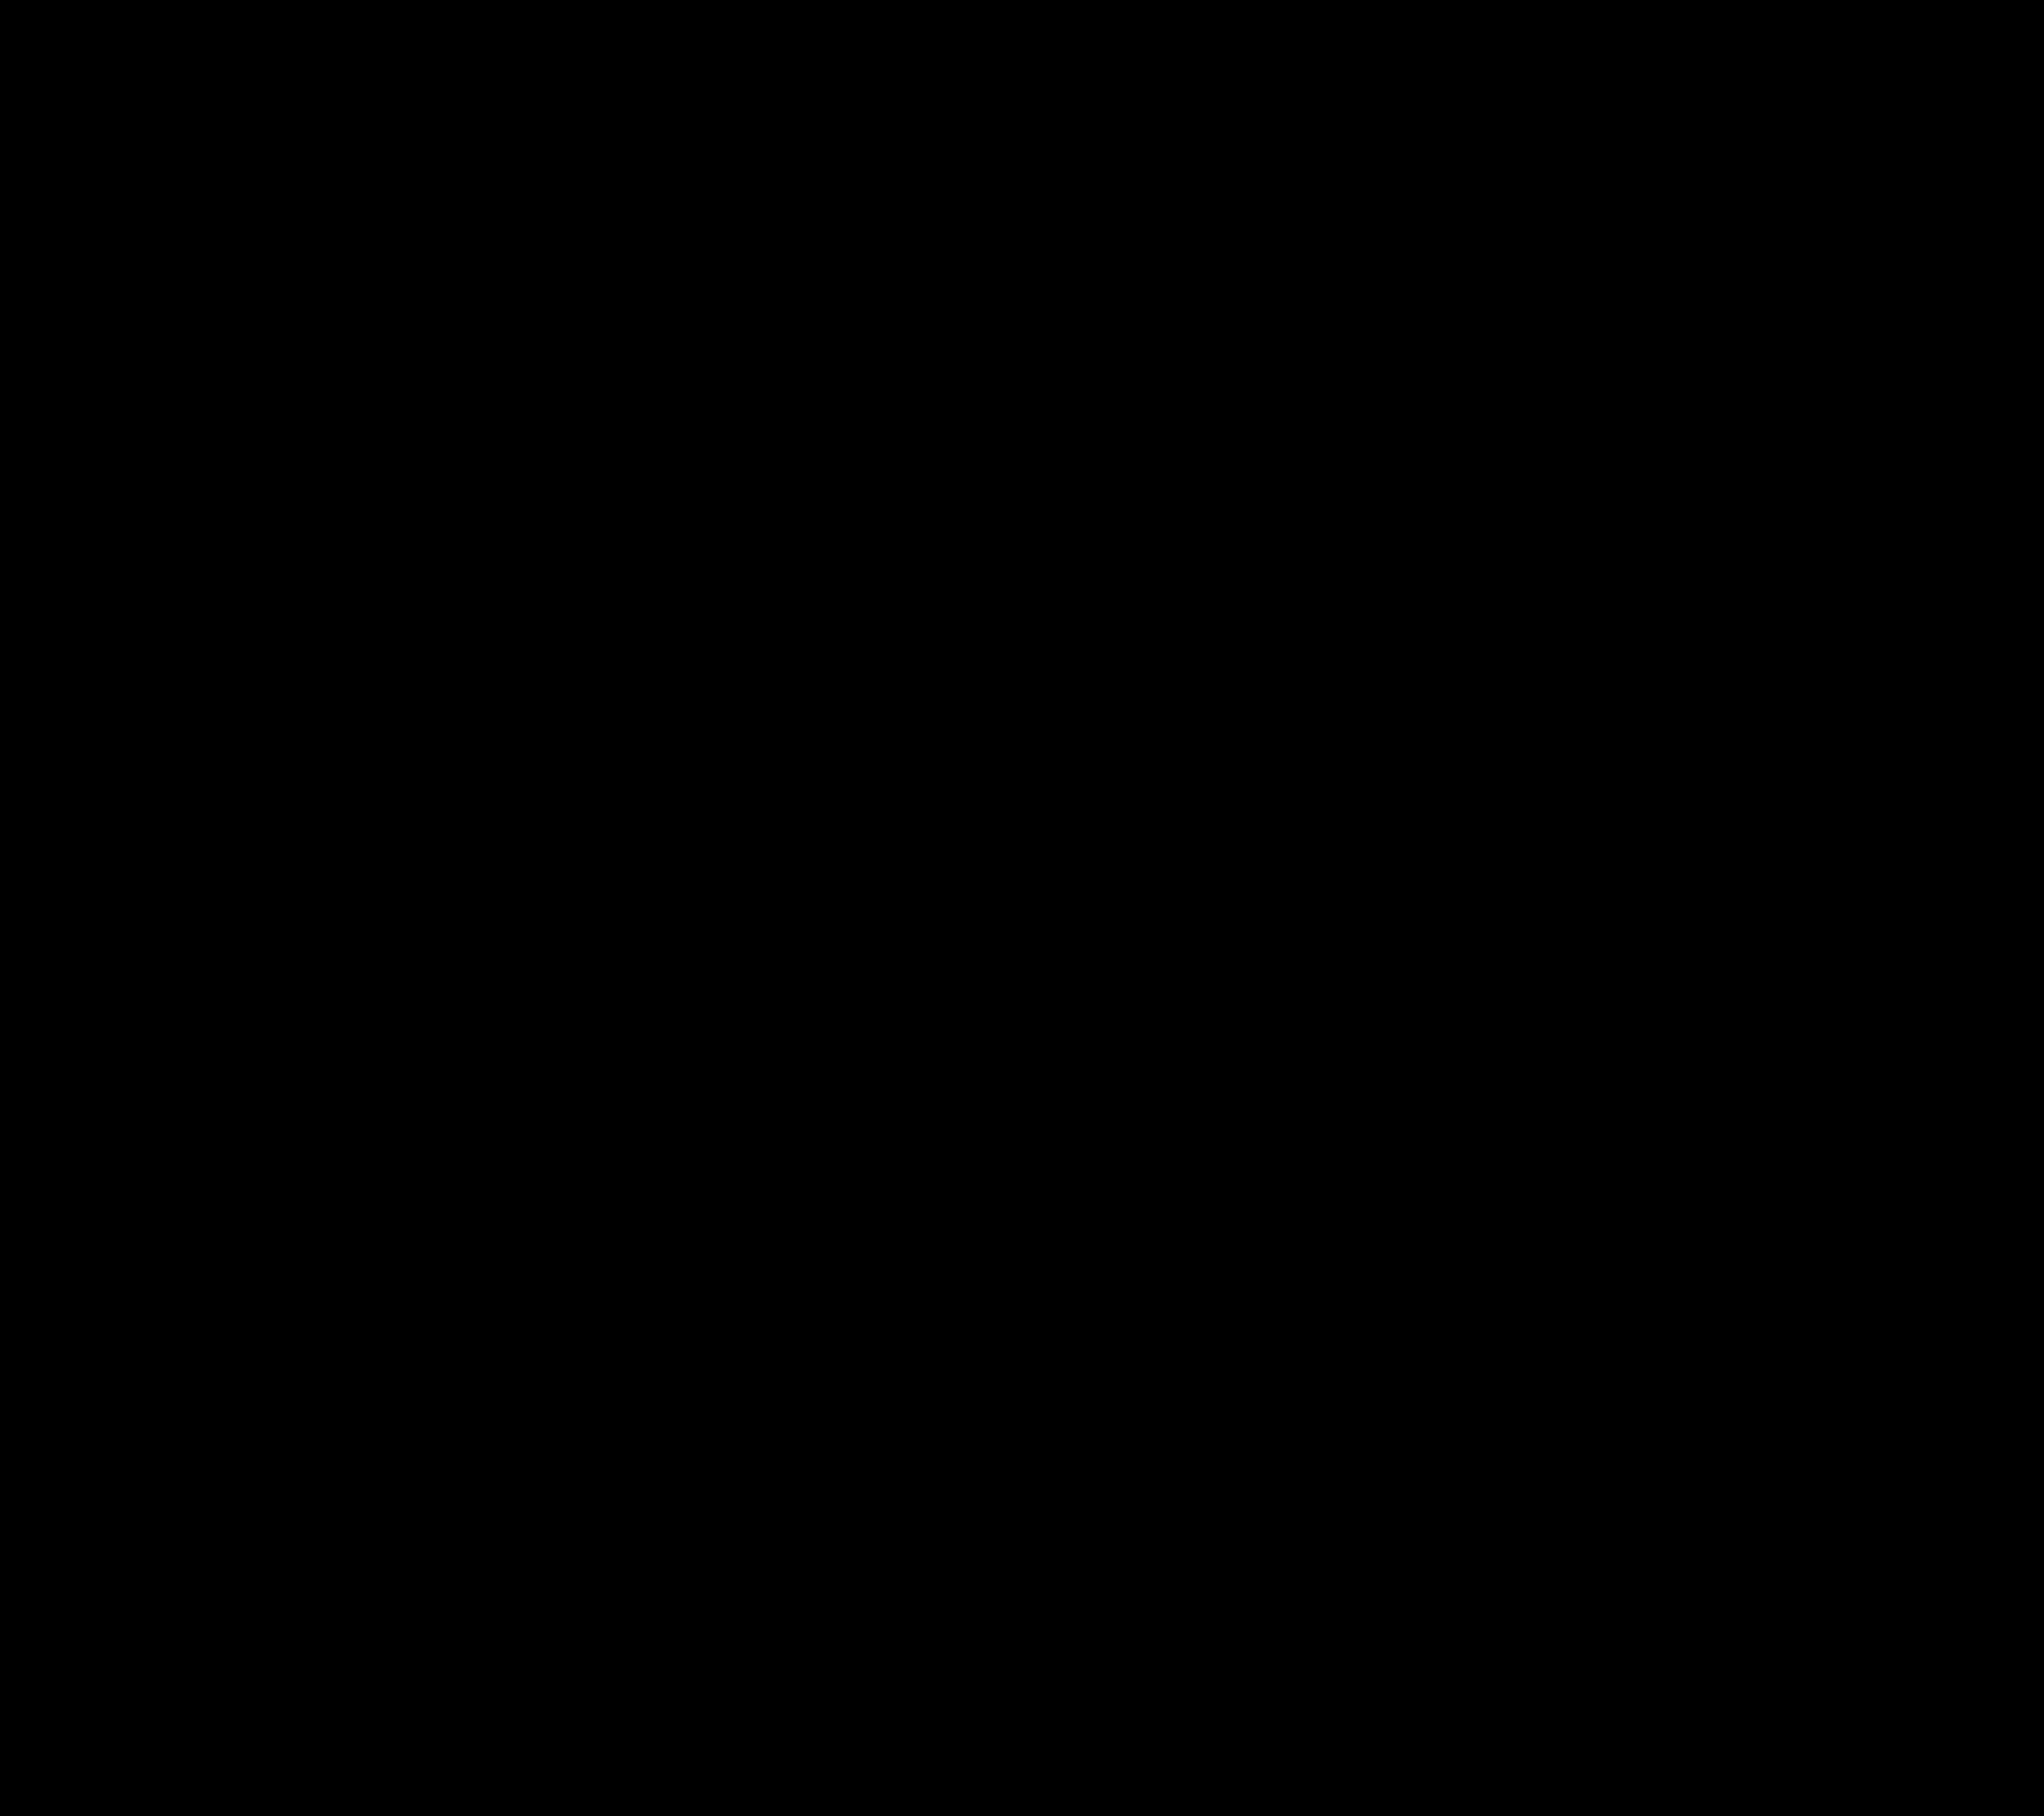 svg-3